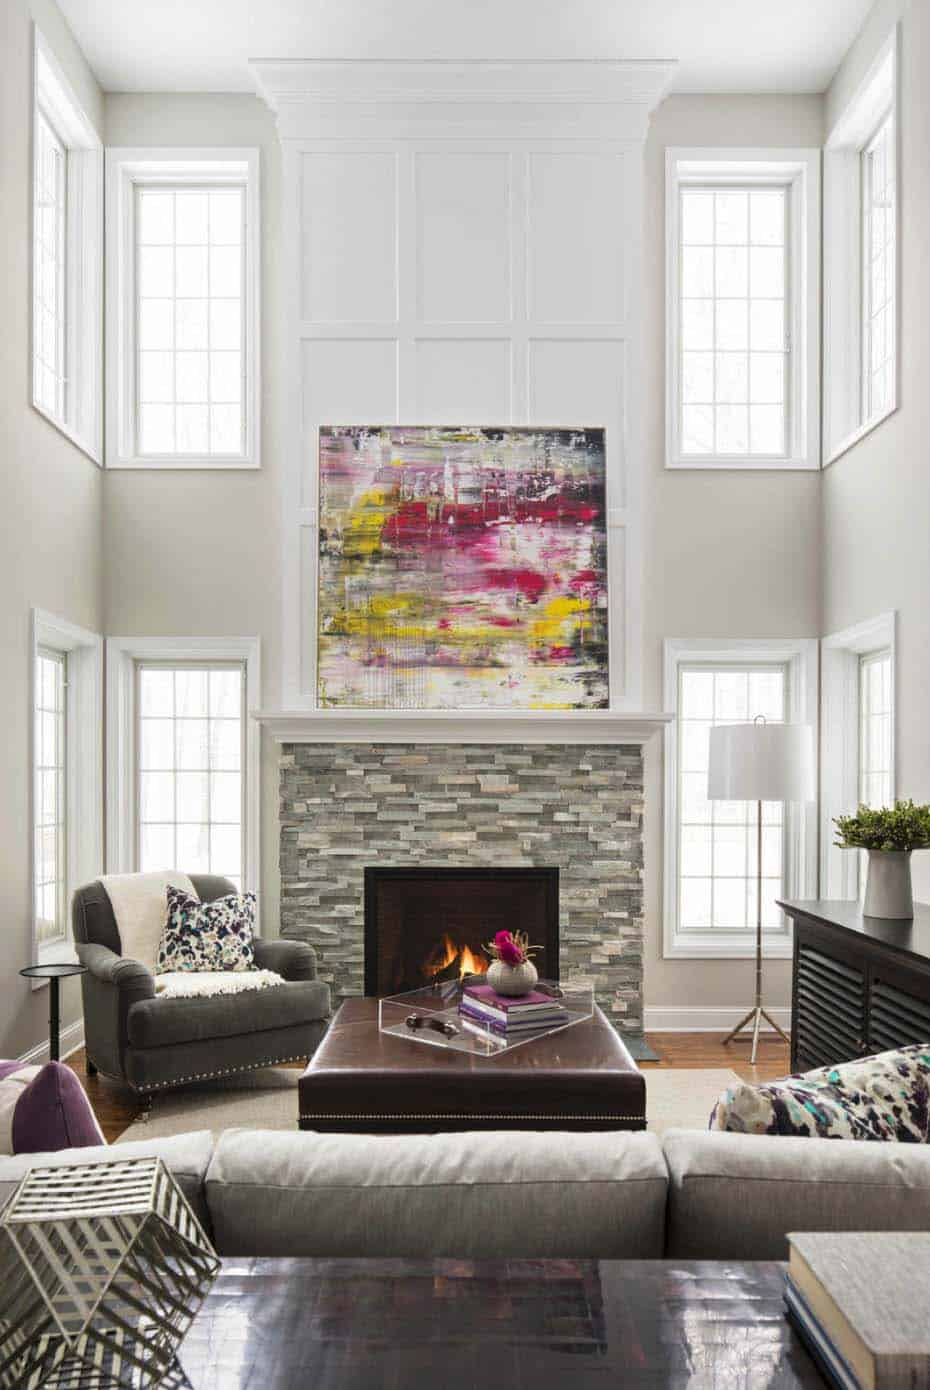 Interior Spaces Showcasing Color Greige-06-1 Kindesign